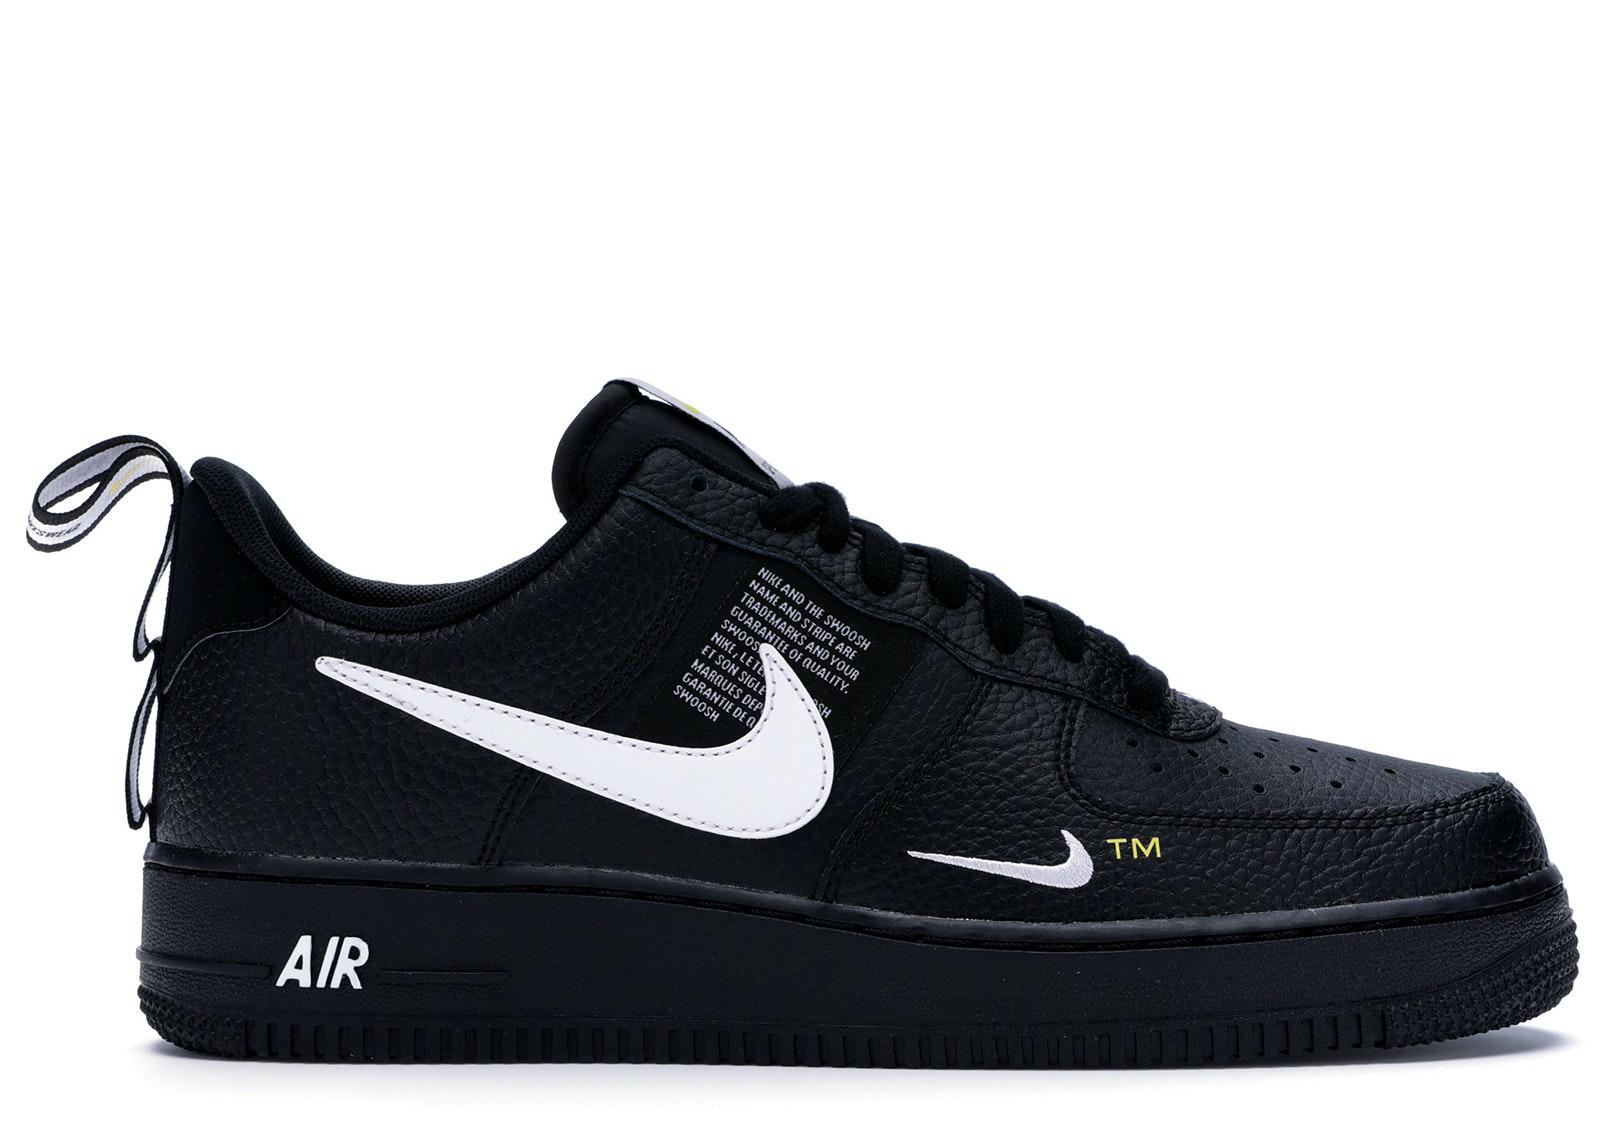 Buy Nike Air Force 1 Shoes Deadstock Sneakers